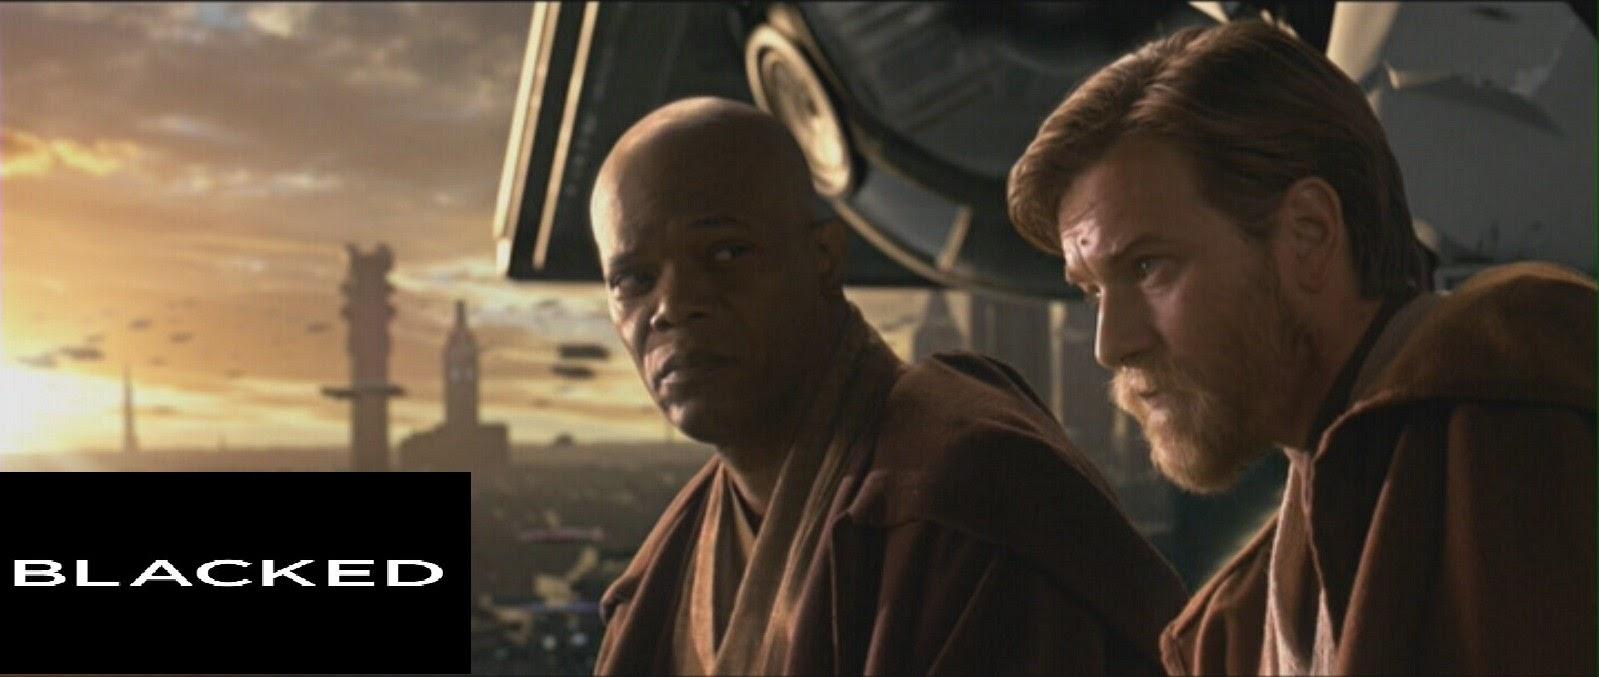 SS - Mace Windu (Meatpants) vs. Obi-Wan Kenobi (KingofBlades) PpIRk94E7rdH1yTgqTMLCJ5TJ9tJboVv9gqYgrzpYAGcgwow3YnbhVaFXP95SB0uS93sQpl2zeJxunYD6drNov-heg5XmiT5K4E0